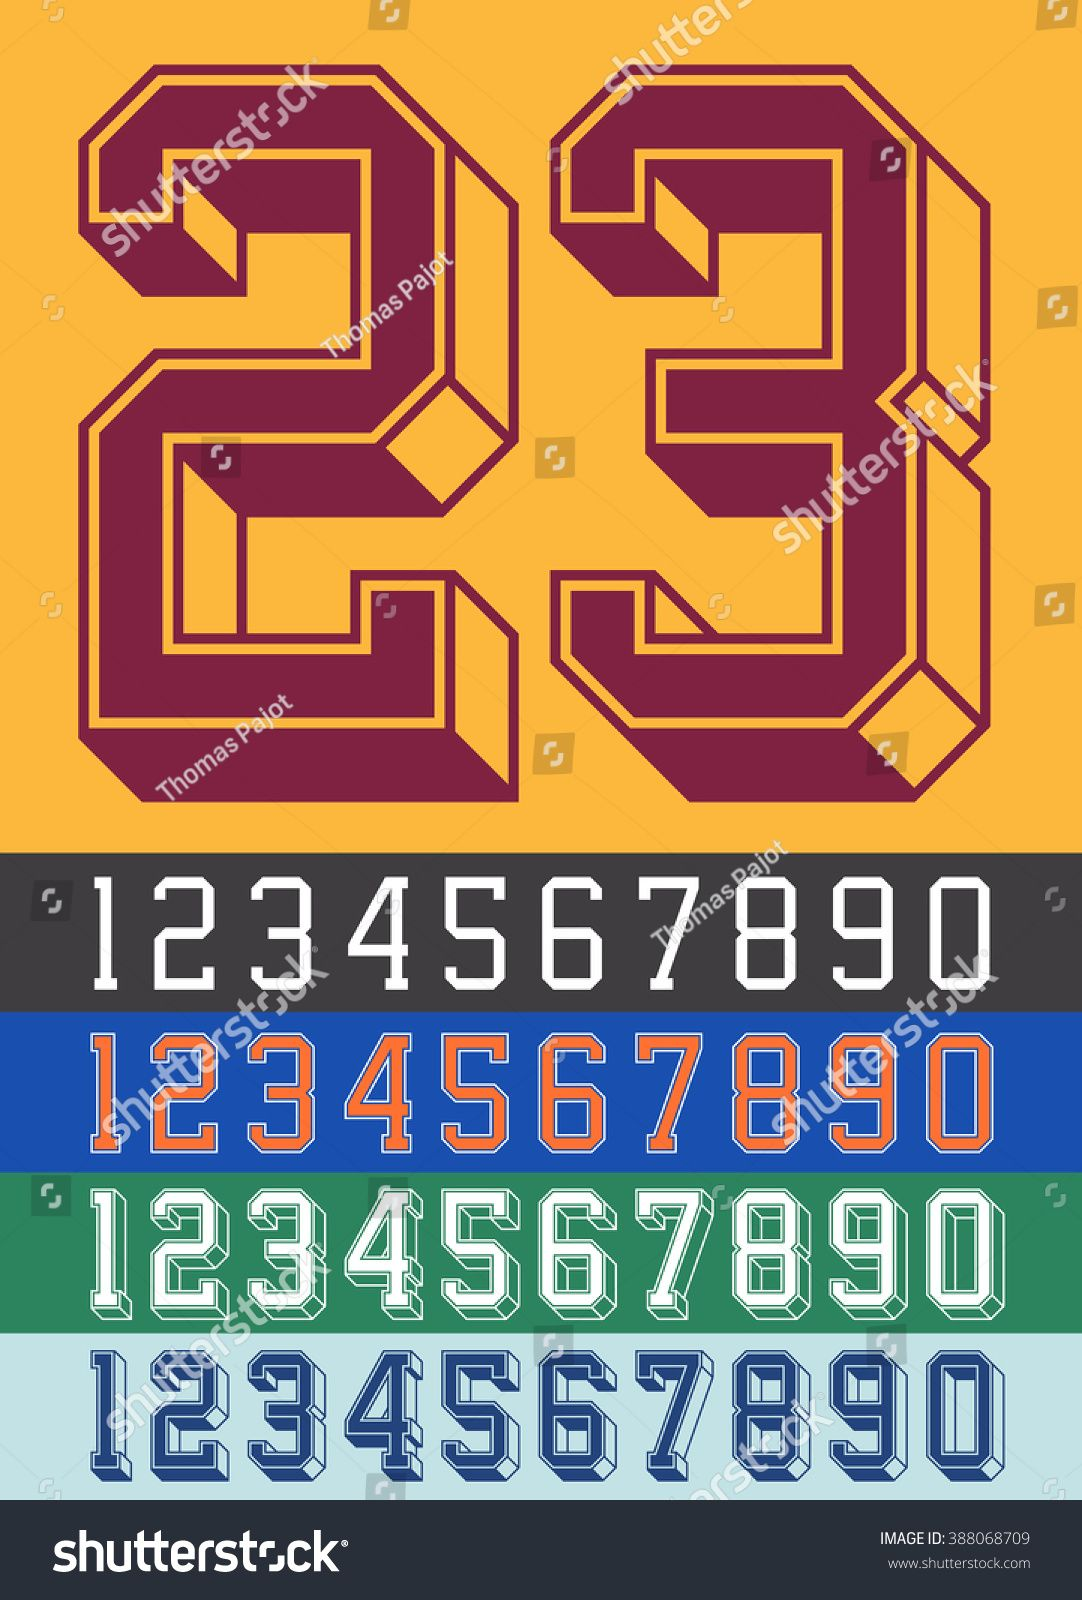 Vintage Jersey Font Numbers Sponsored Ad Jersey Vintage Numbers Font Jersey Font Numbers Font Vintage Jerseys